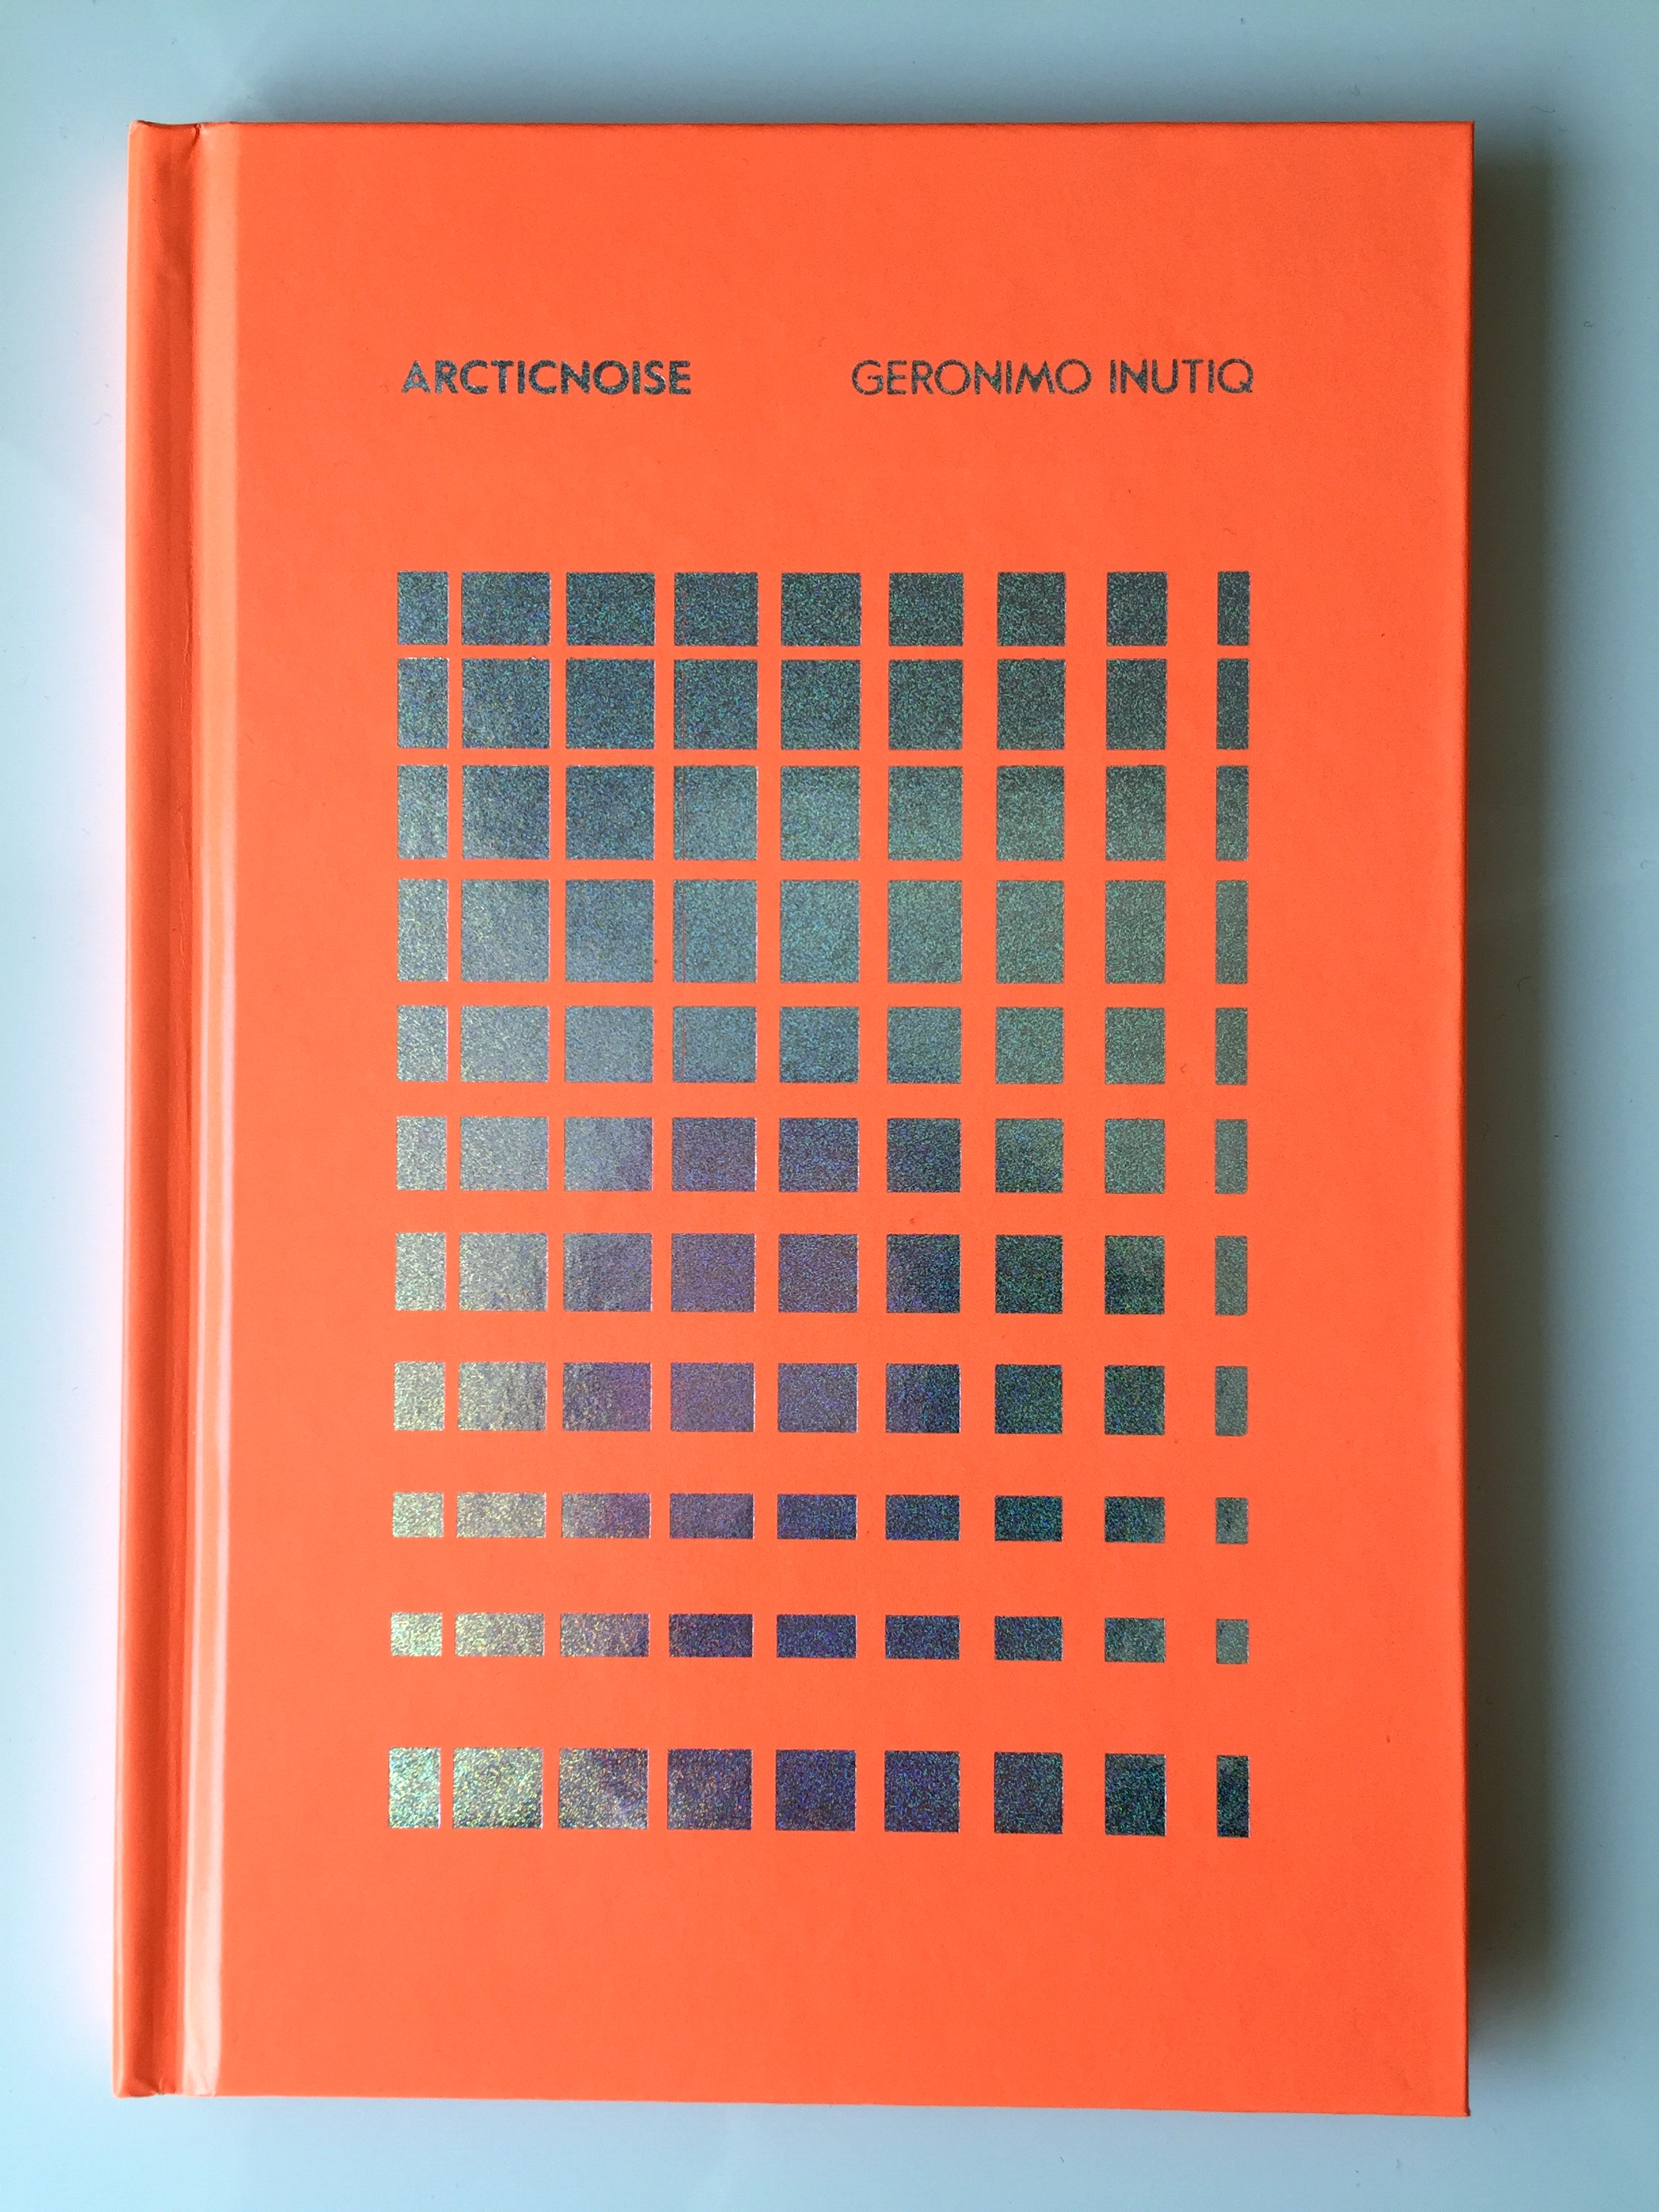 Geronimo Inutiq: ARCTICNOISE